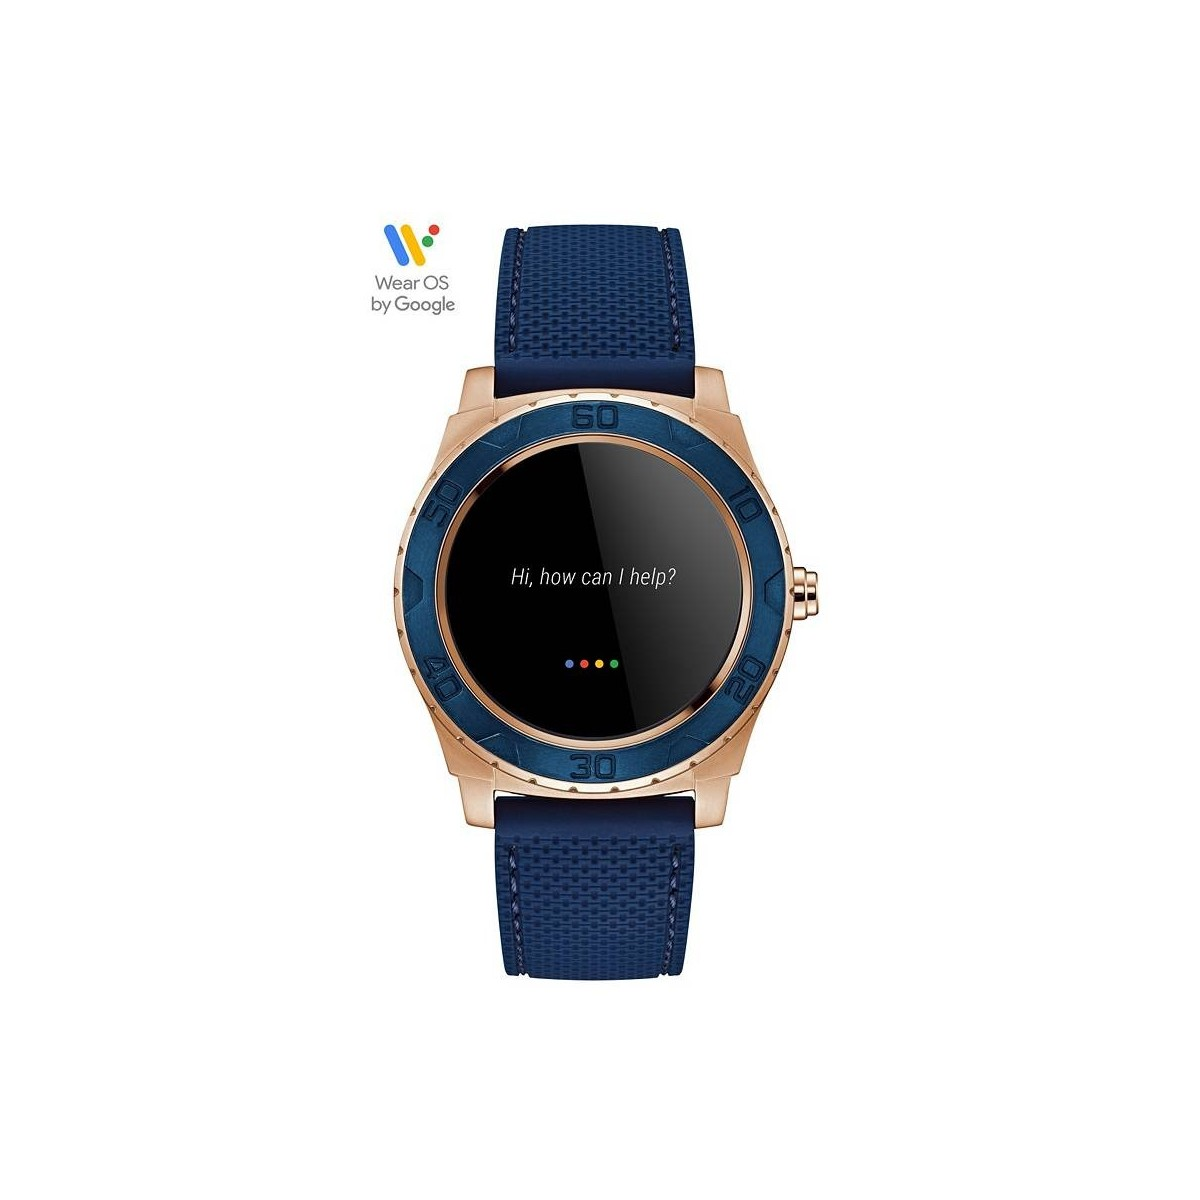 https://www.gaberjoyeria.com/4839-thickbox_default/reloj-guess-smart.jpg